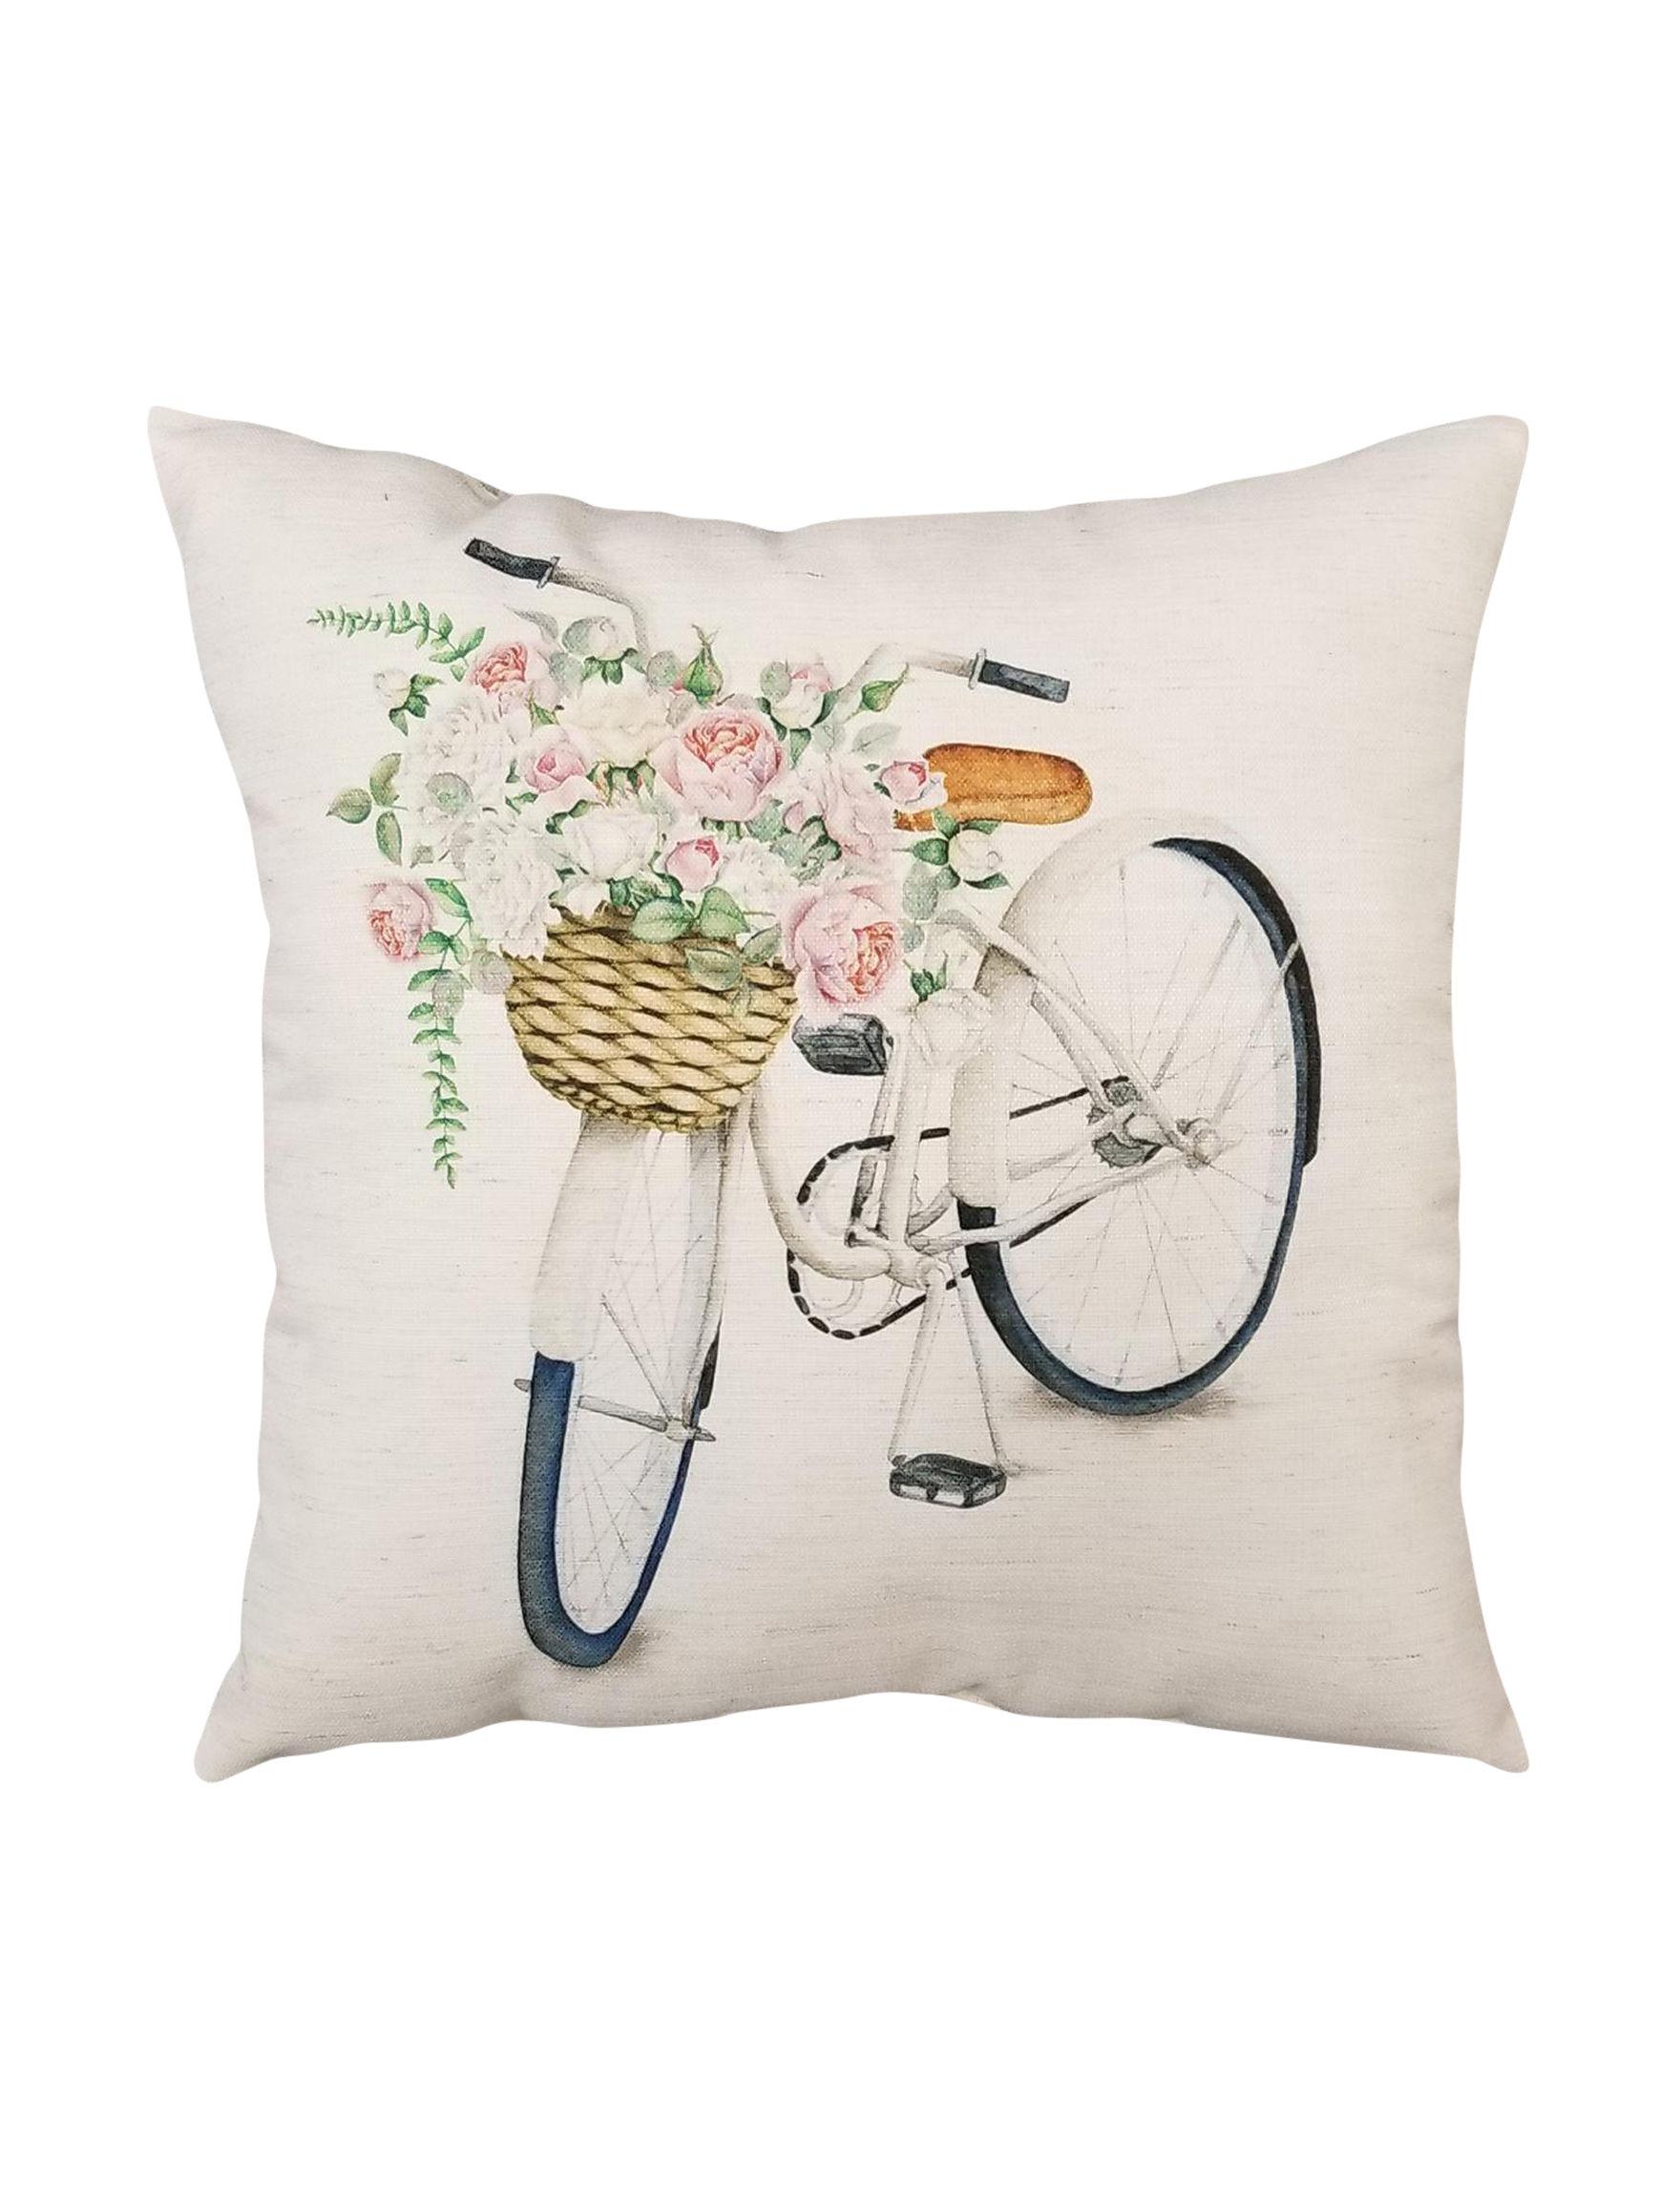 Home Fashions International White / Multi Decorative Pillows